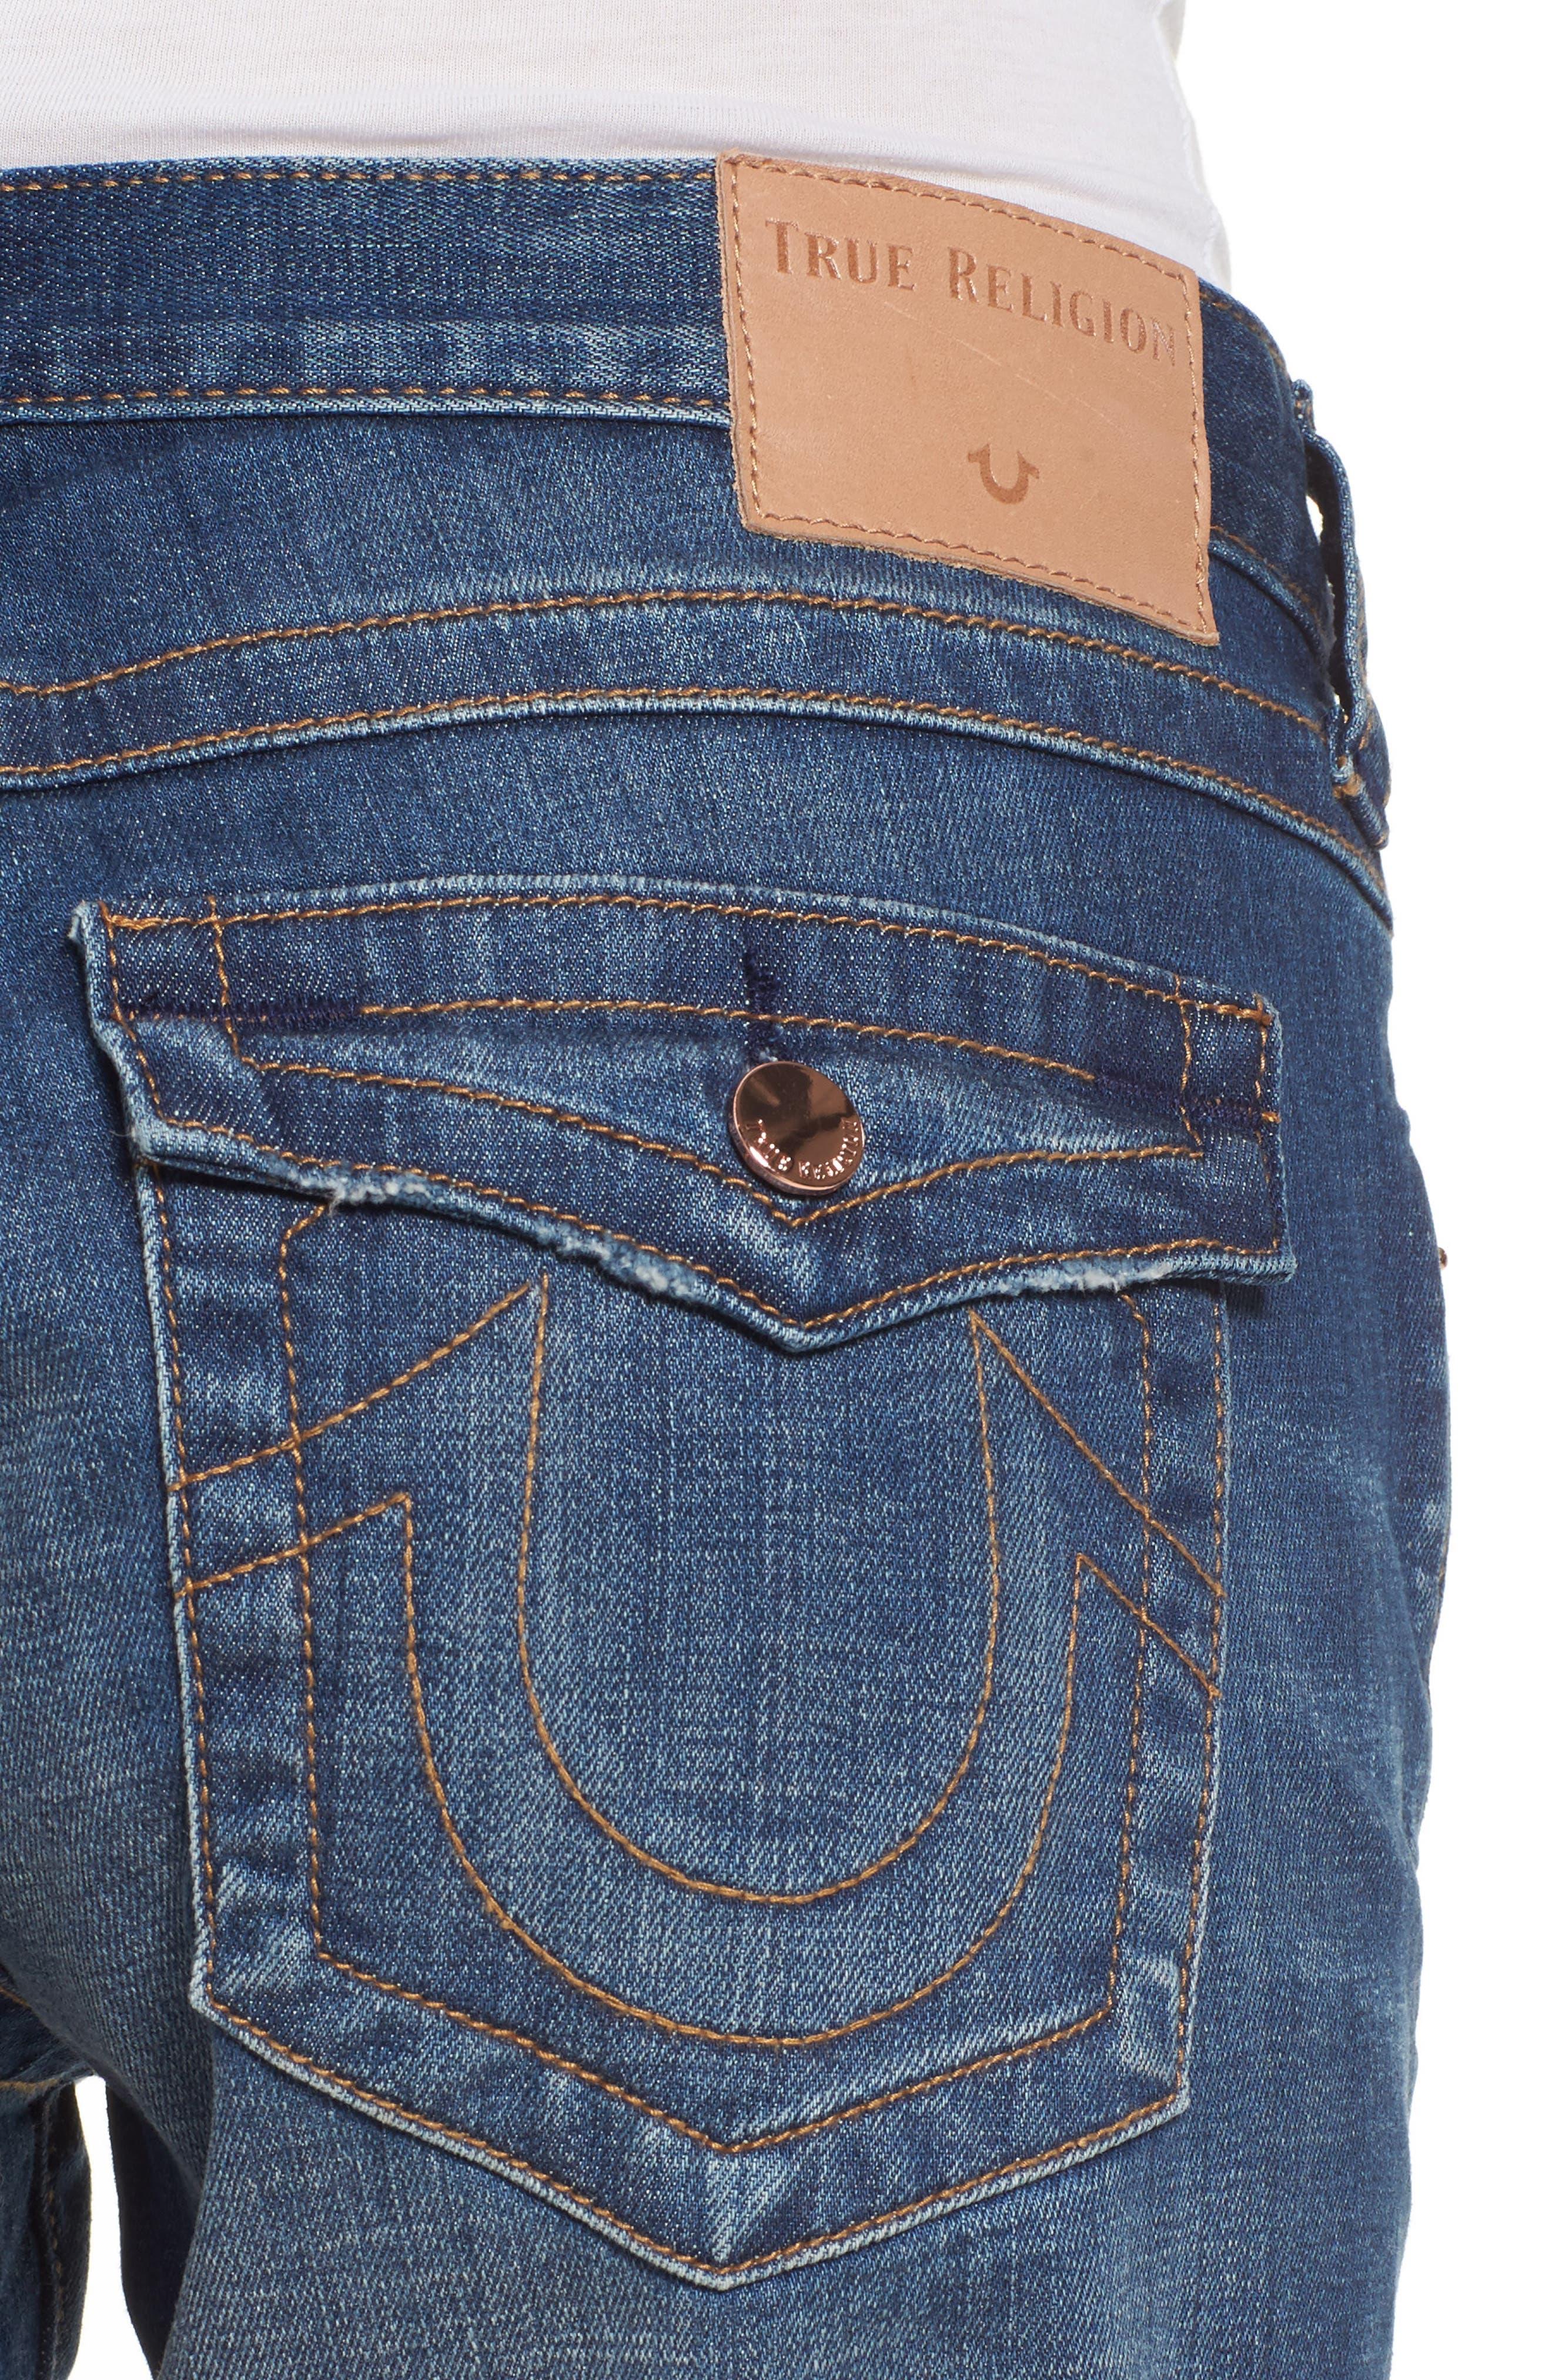 Jayde Shorts,                             Alternate thumbnail 4, color,                             Hardware Blue